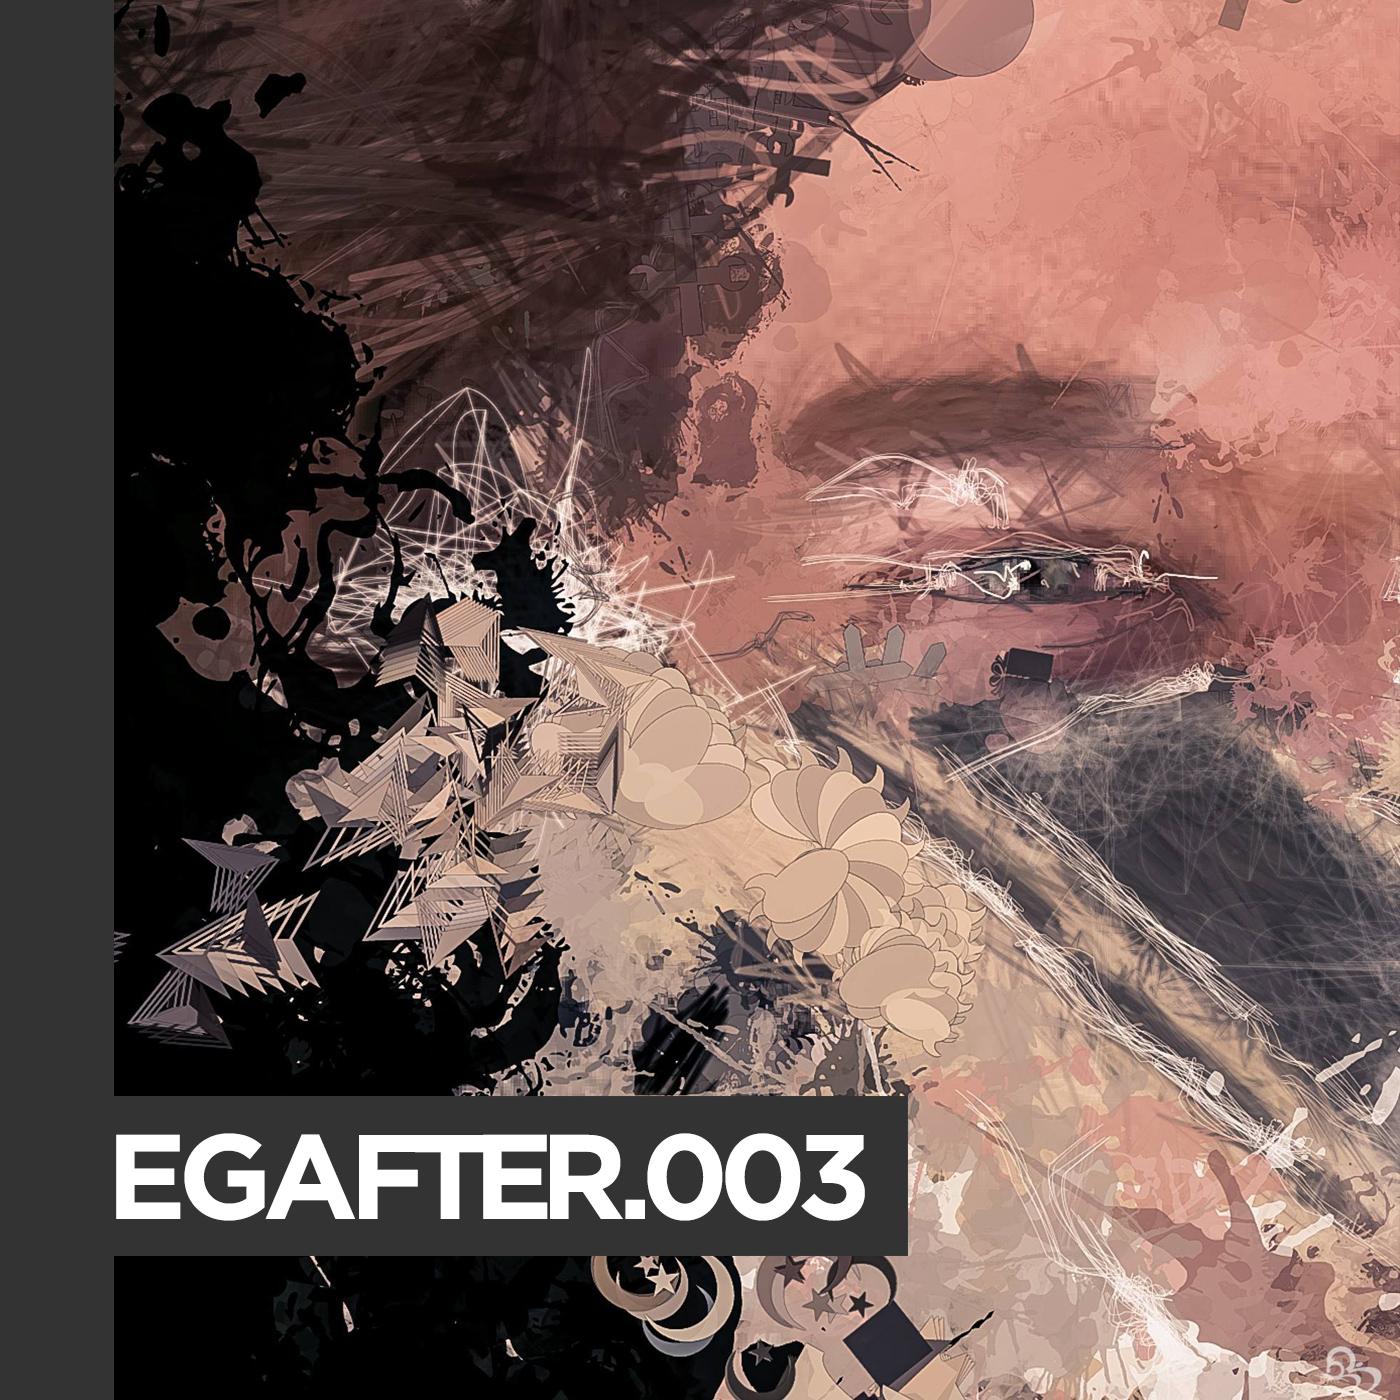 EGAFTER.003 Timujin